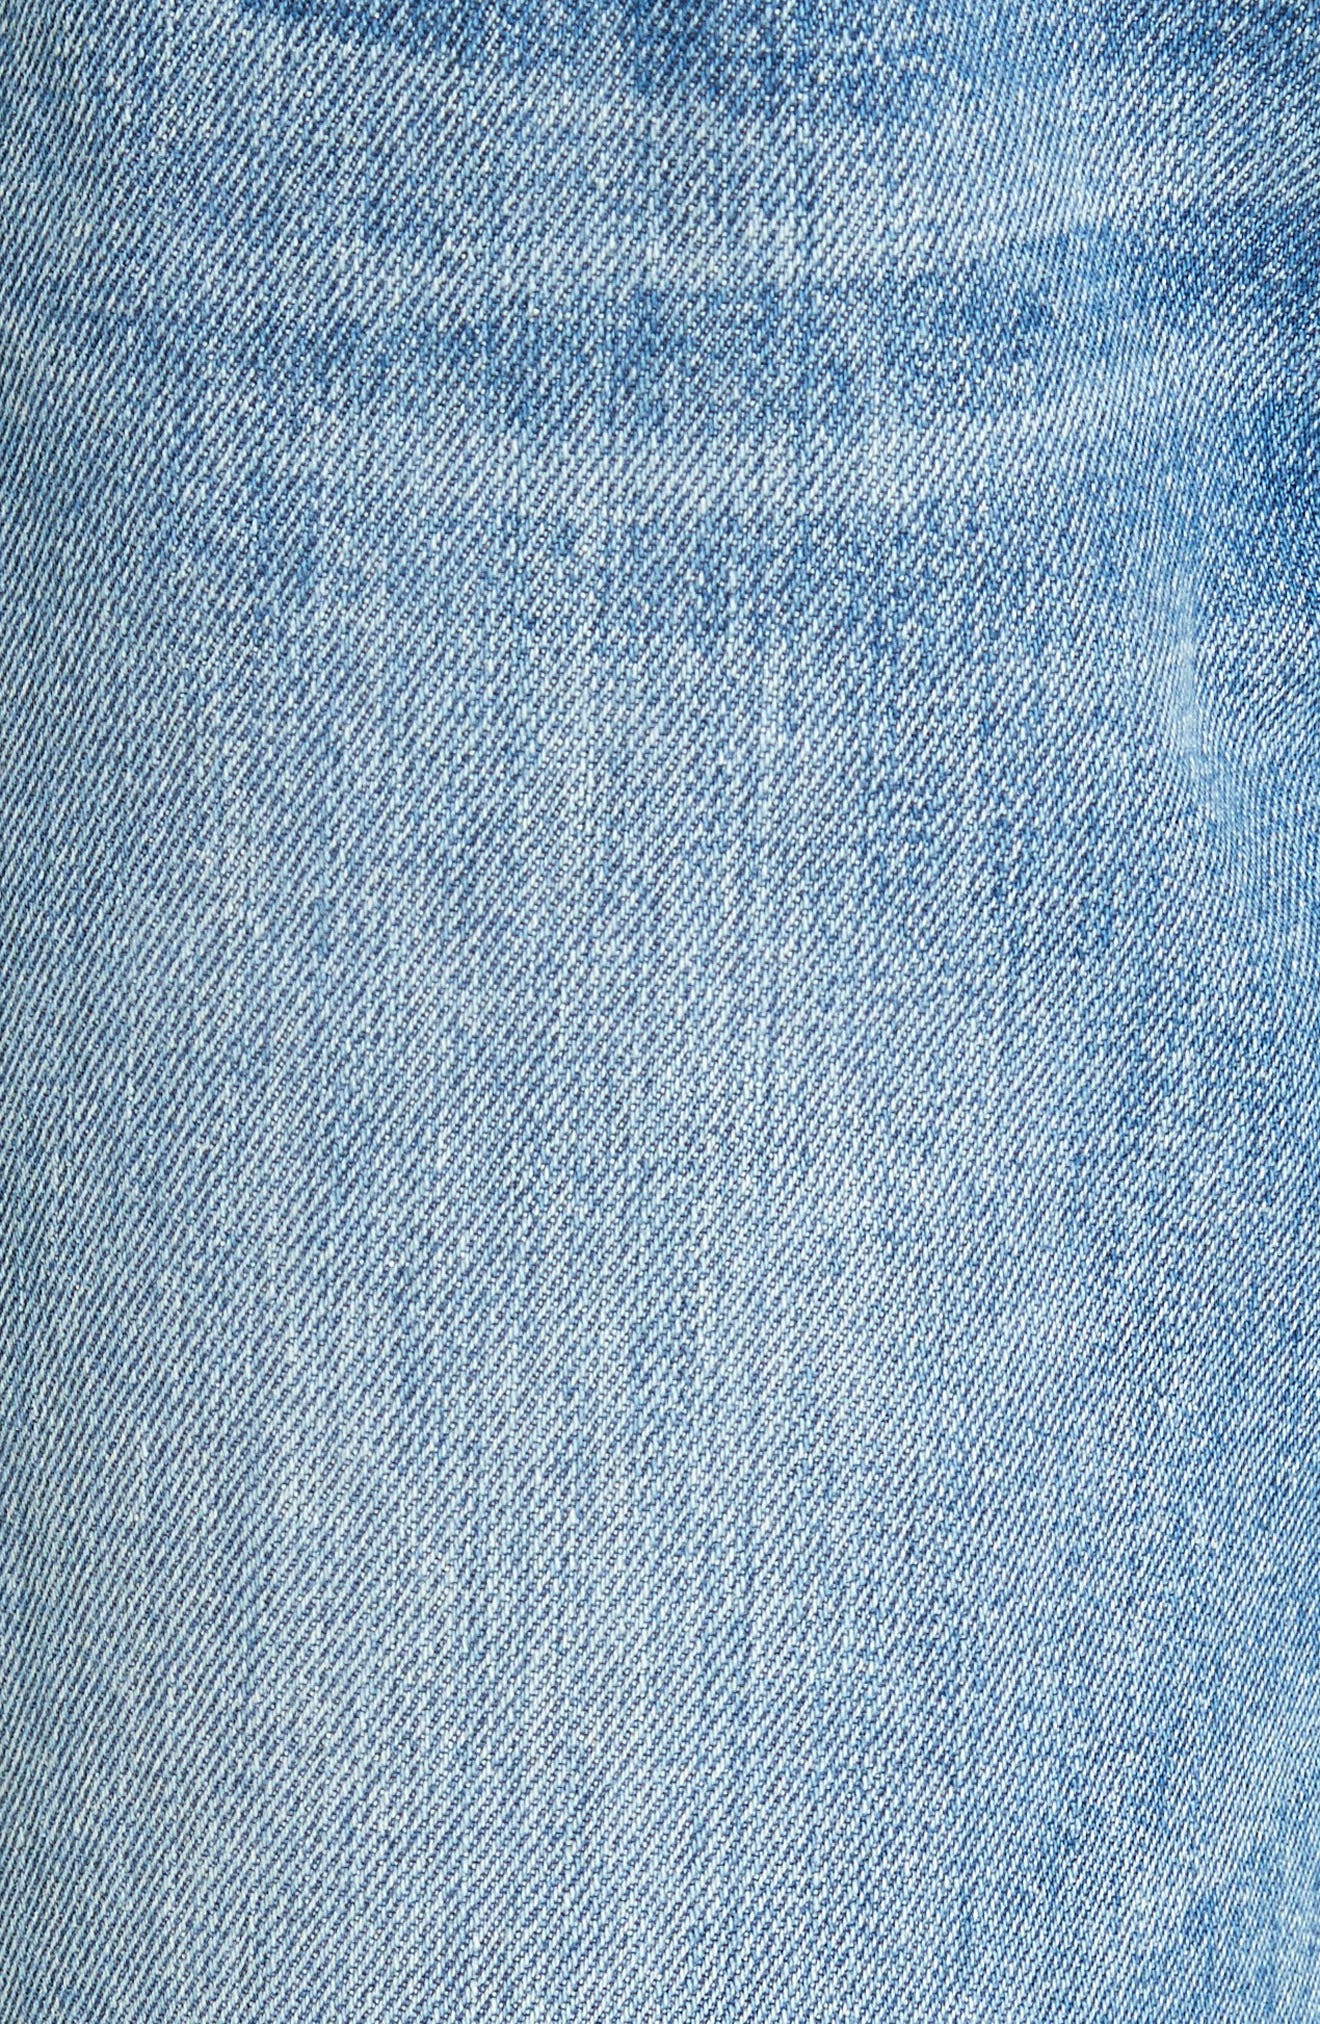 Lou High Waist Jeans,                             Alternate thumbnail 5, color,                             458